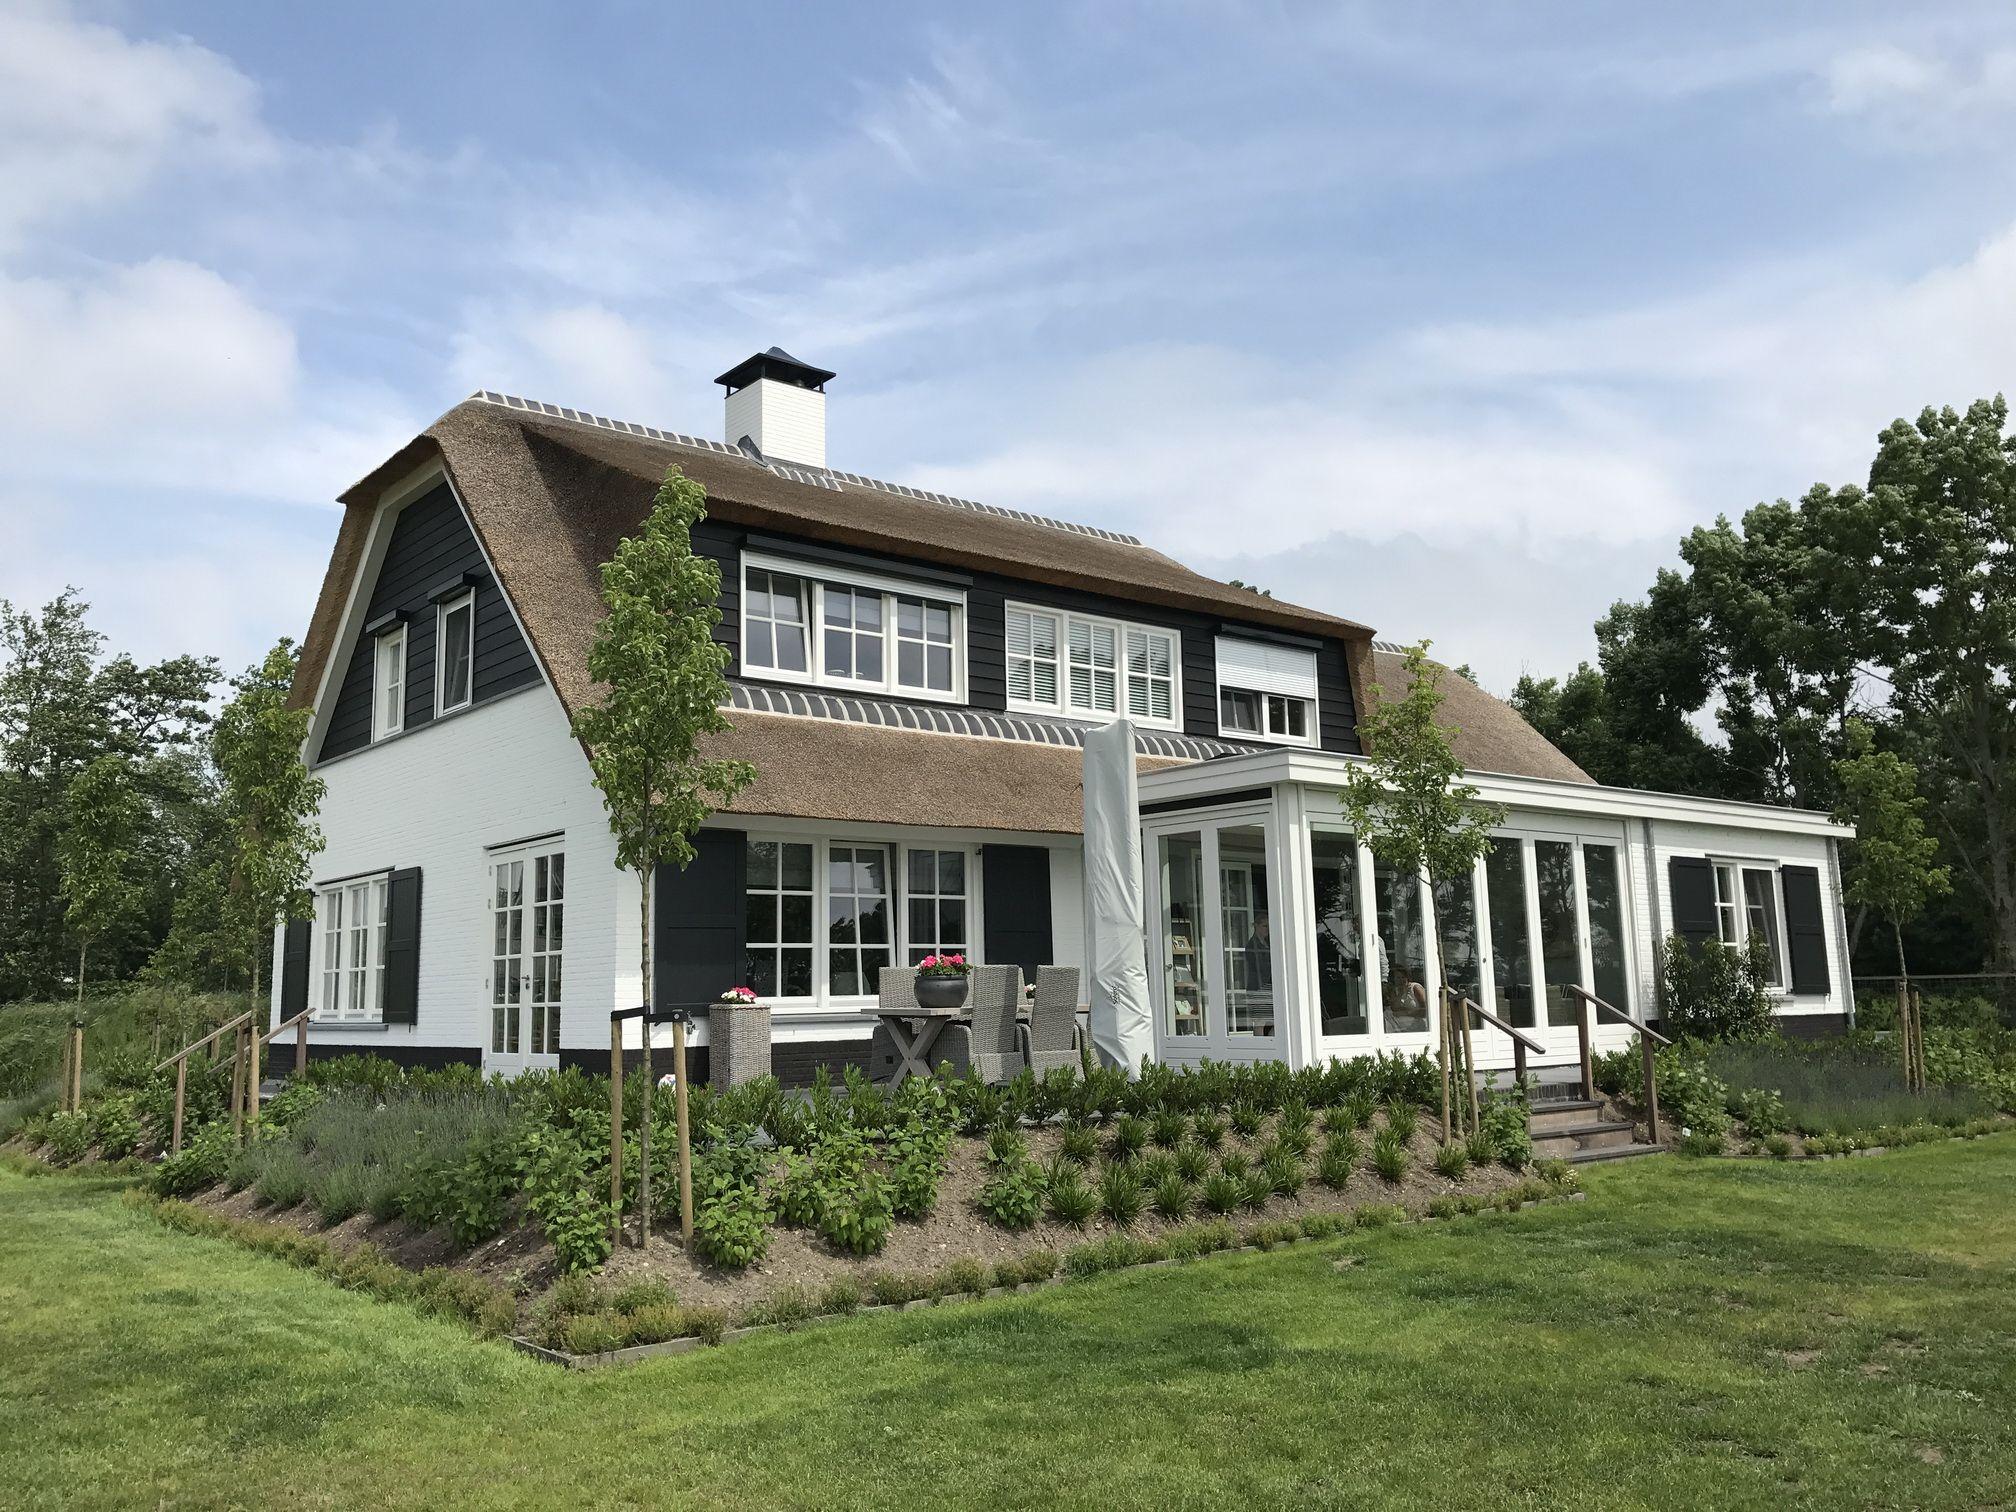 Landelijke woning witte gevels rieten dak wit keimwerk for Landelijke woning